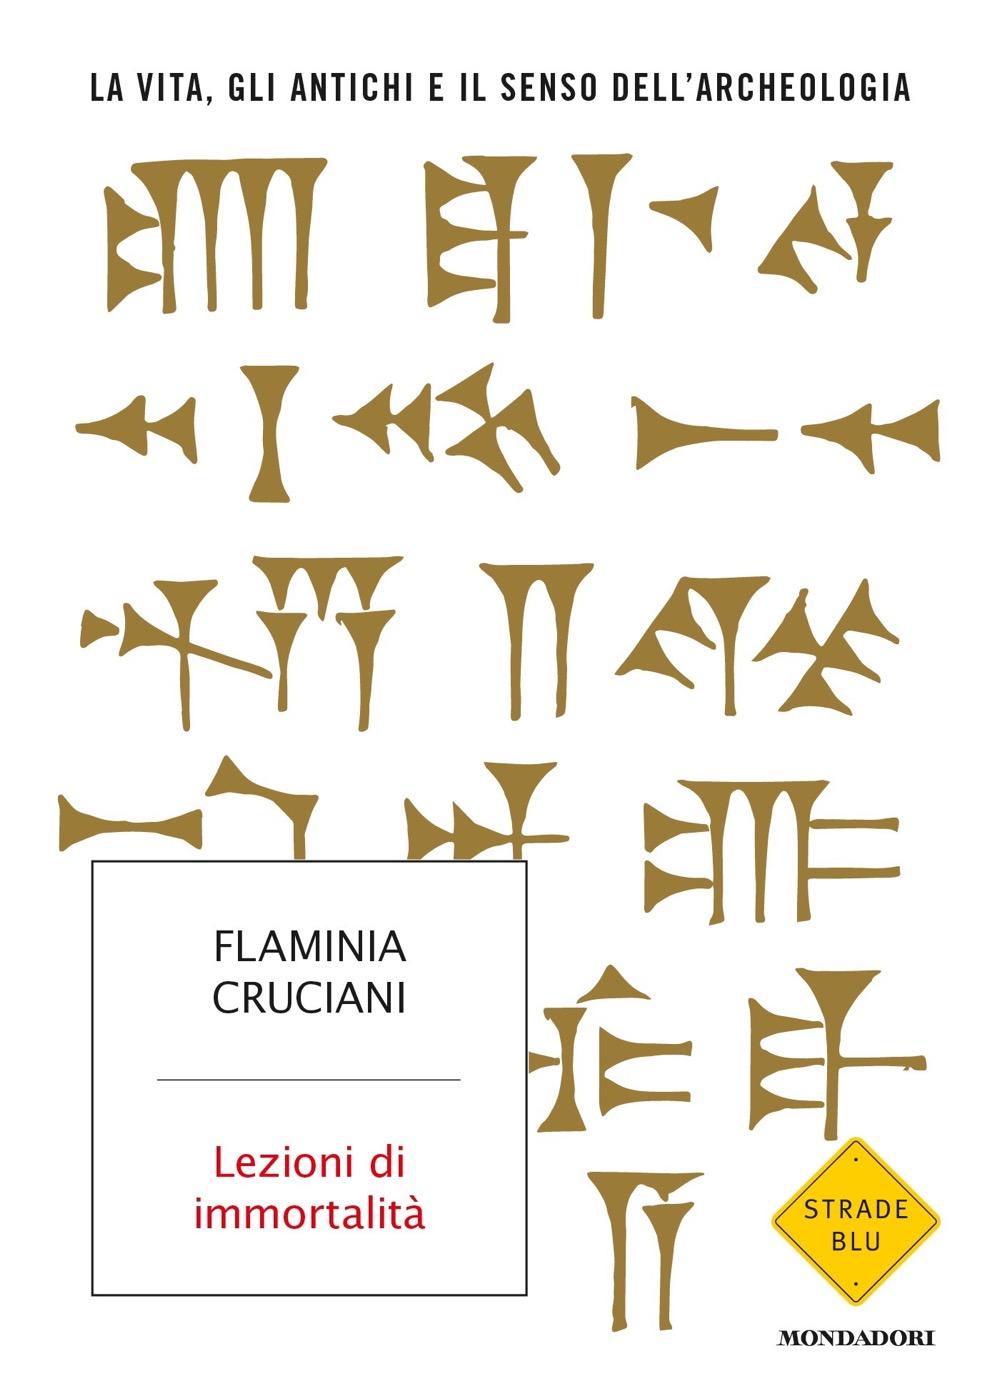 Flaminia Cruciani